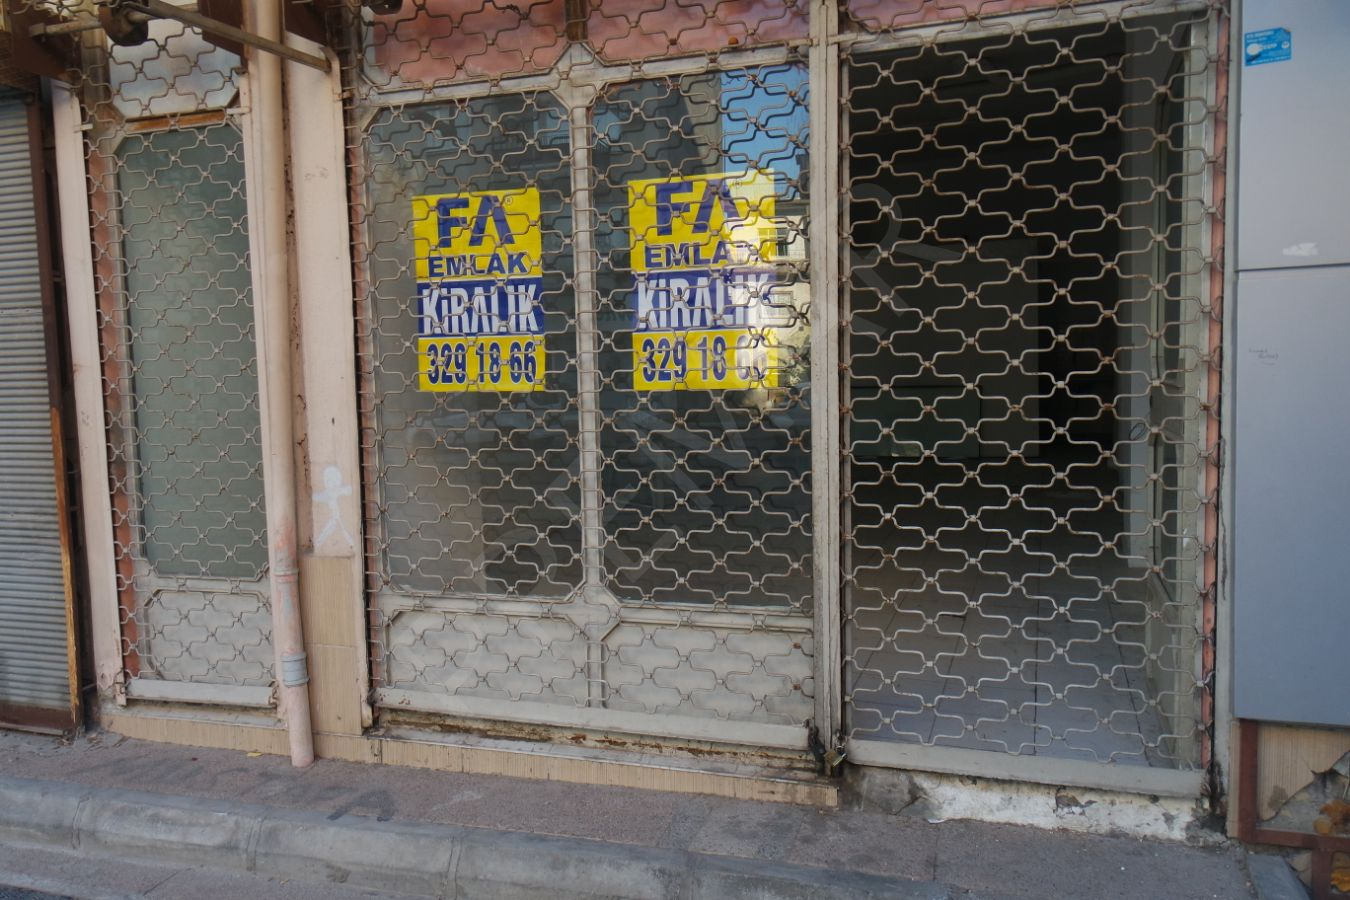 Premar Fa'dan Burhan Felek Cad. Kiralık Dükkan !!!